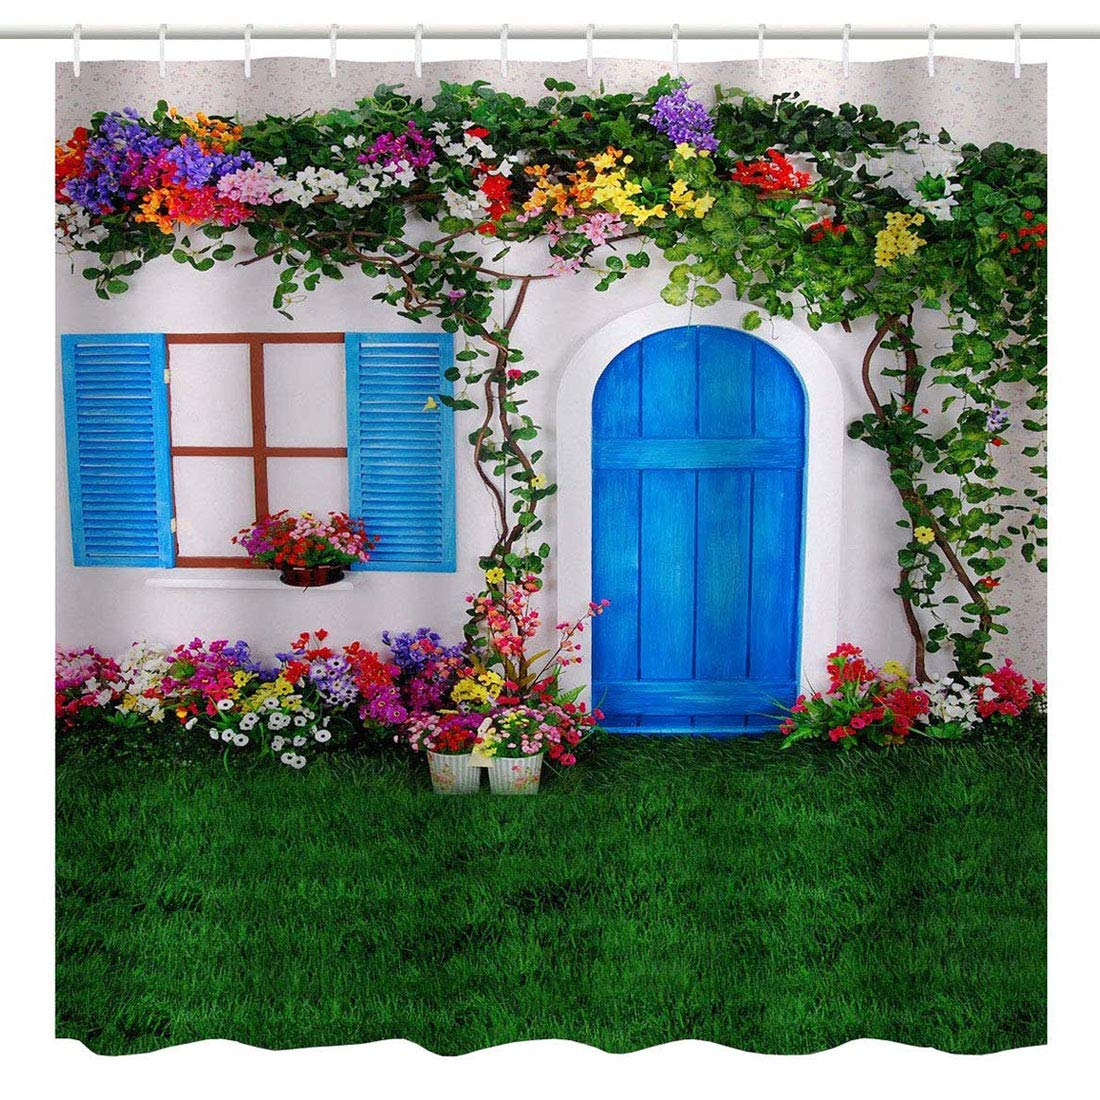 Garden Home Decor Bathroom Shower Curtain, Summer Garden Spanish House with Wooden Door Window Flowers Grass Nature Scenery Art Print, Fabric Waterproof Bathroom Décor Set with Hooks, Green Red white